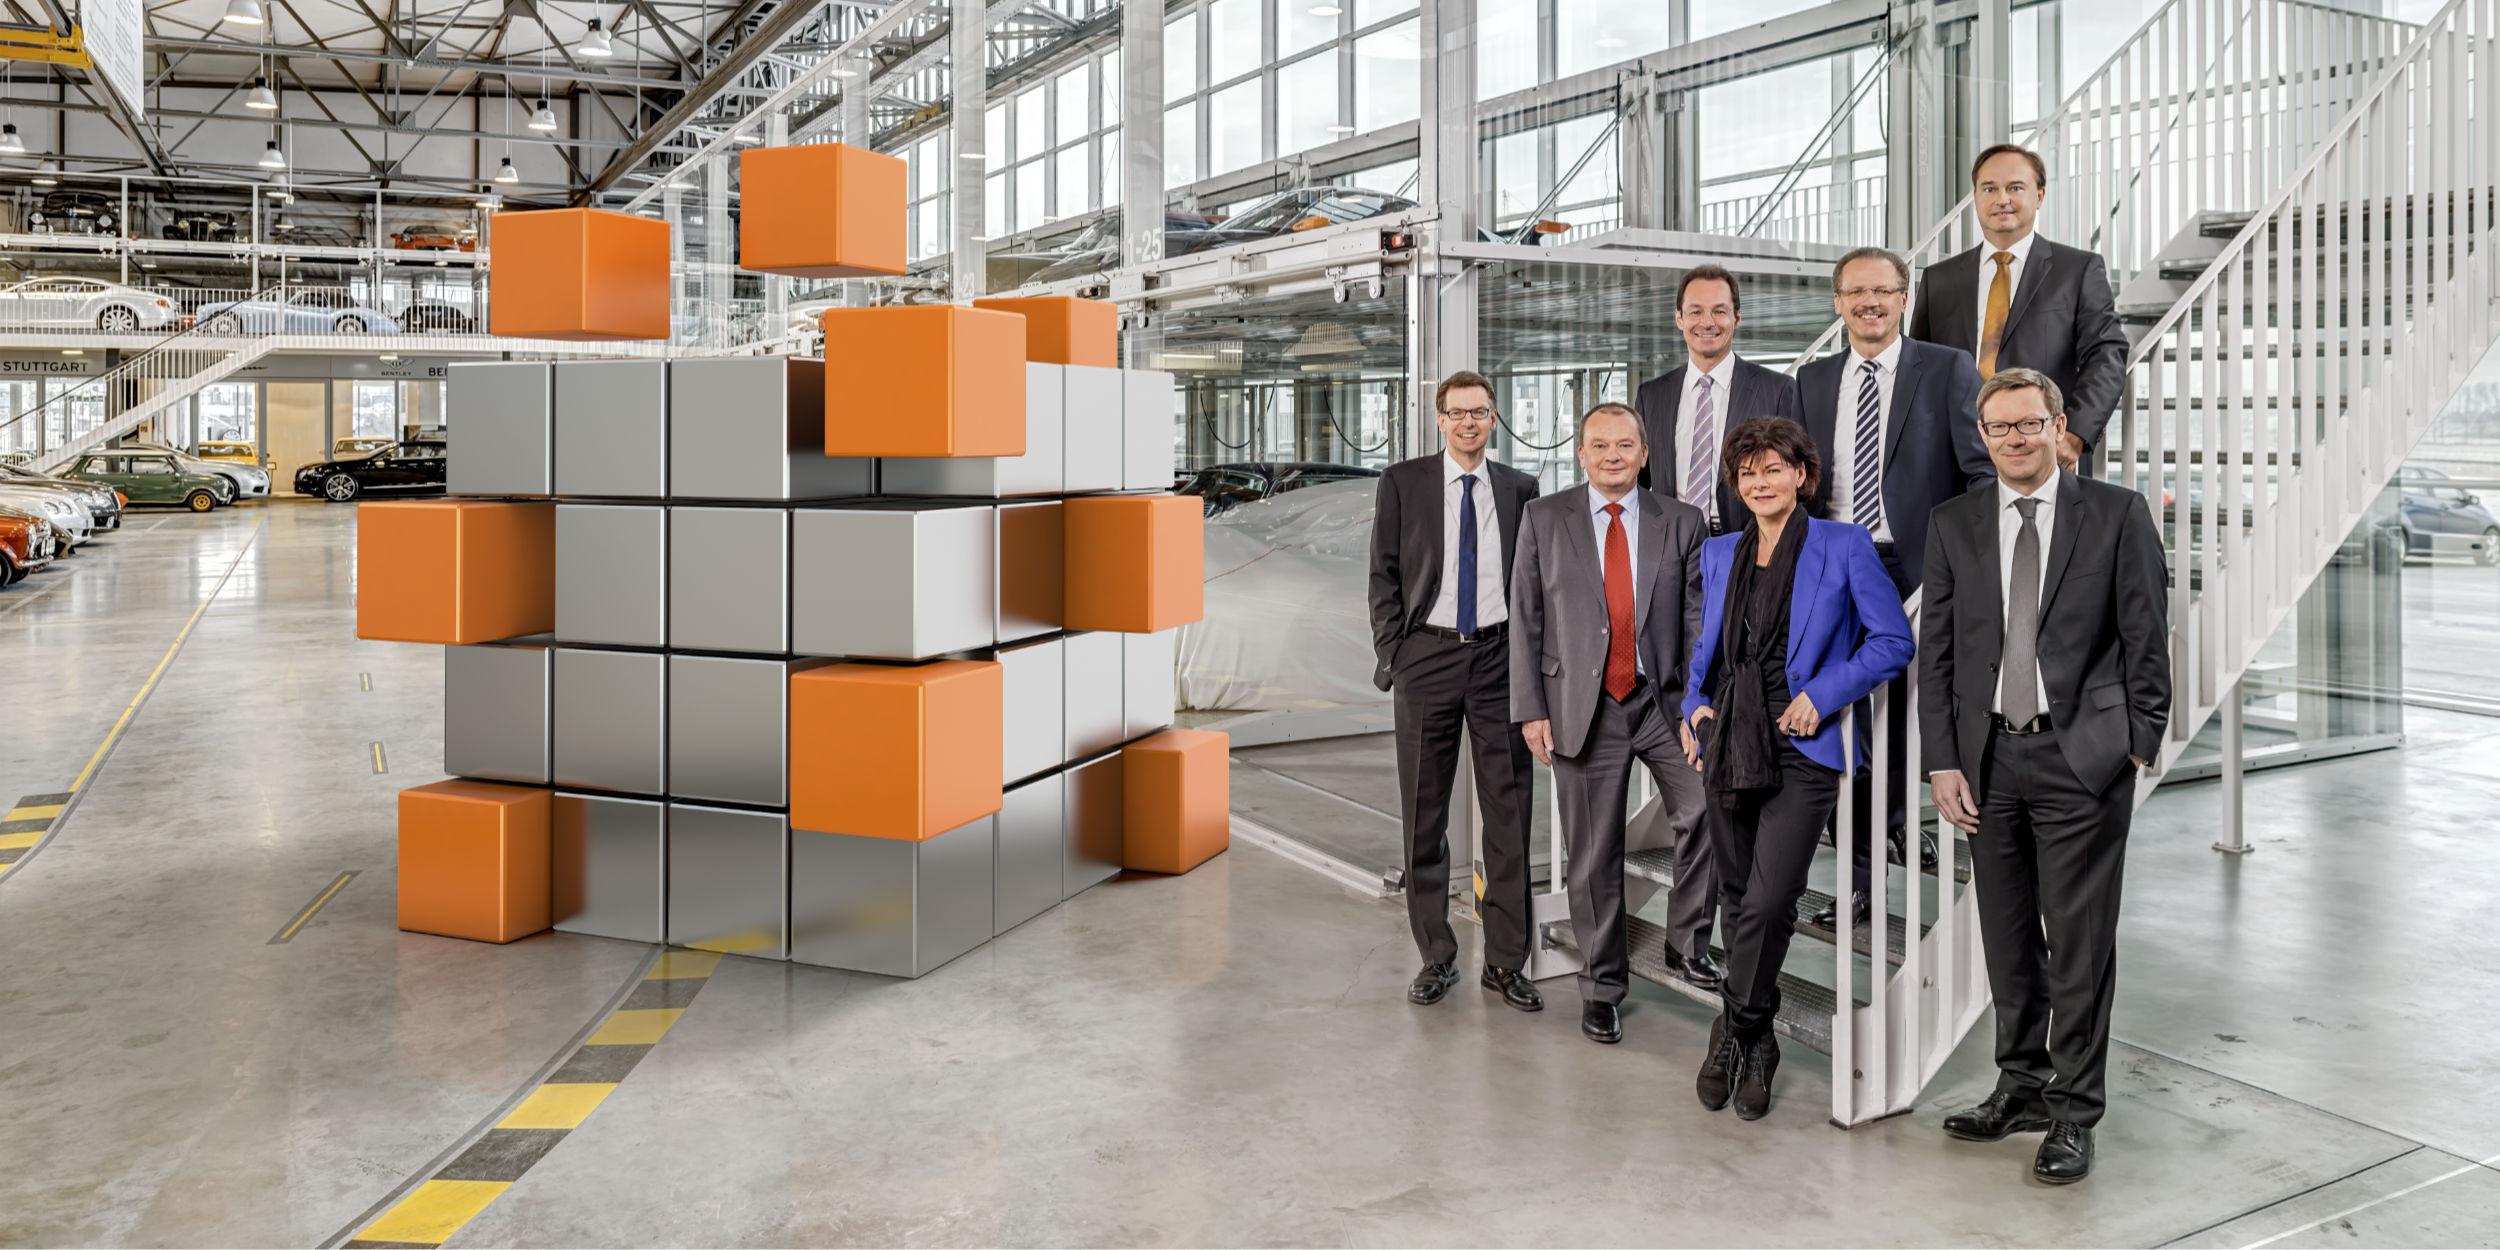 Kampagnen Fotografie Stuttgart und Umgebung Daimler AG CGI Zauberwürfel gemischt mit realer Umgebung der Motorworld Böblingen